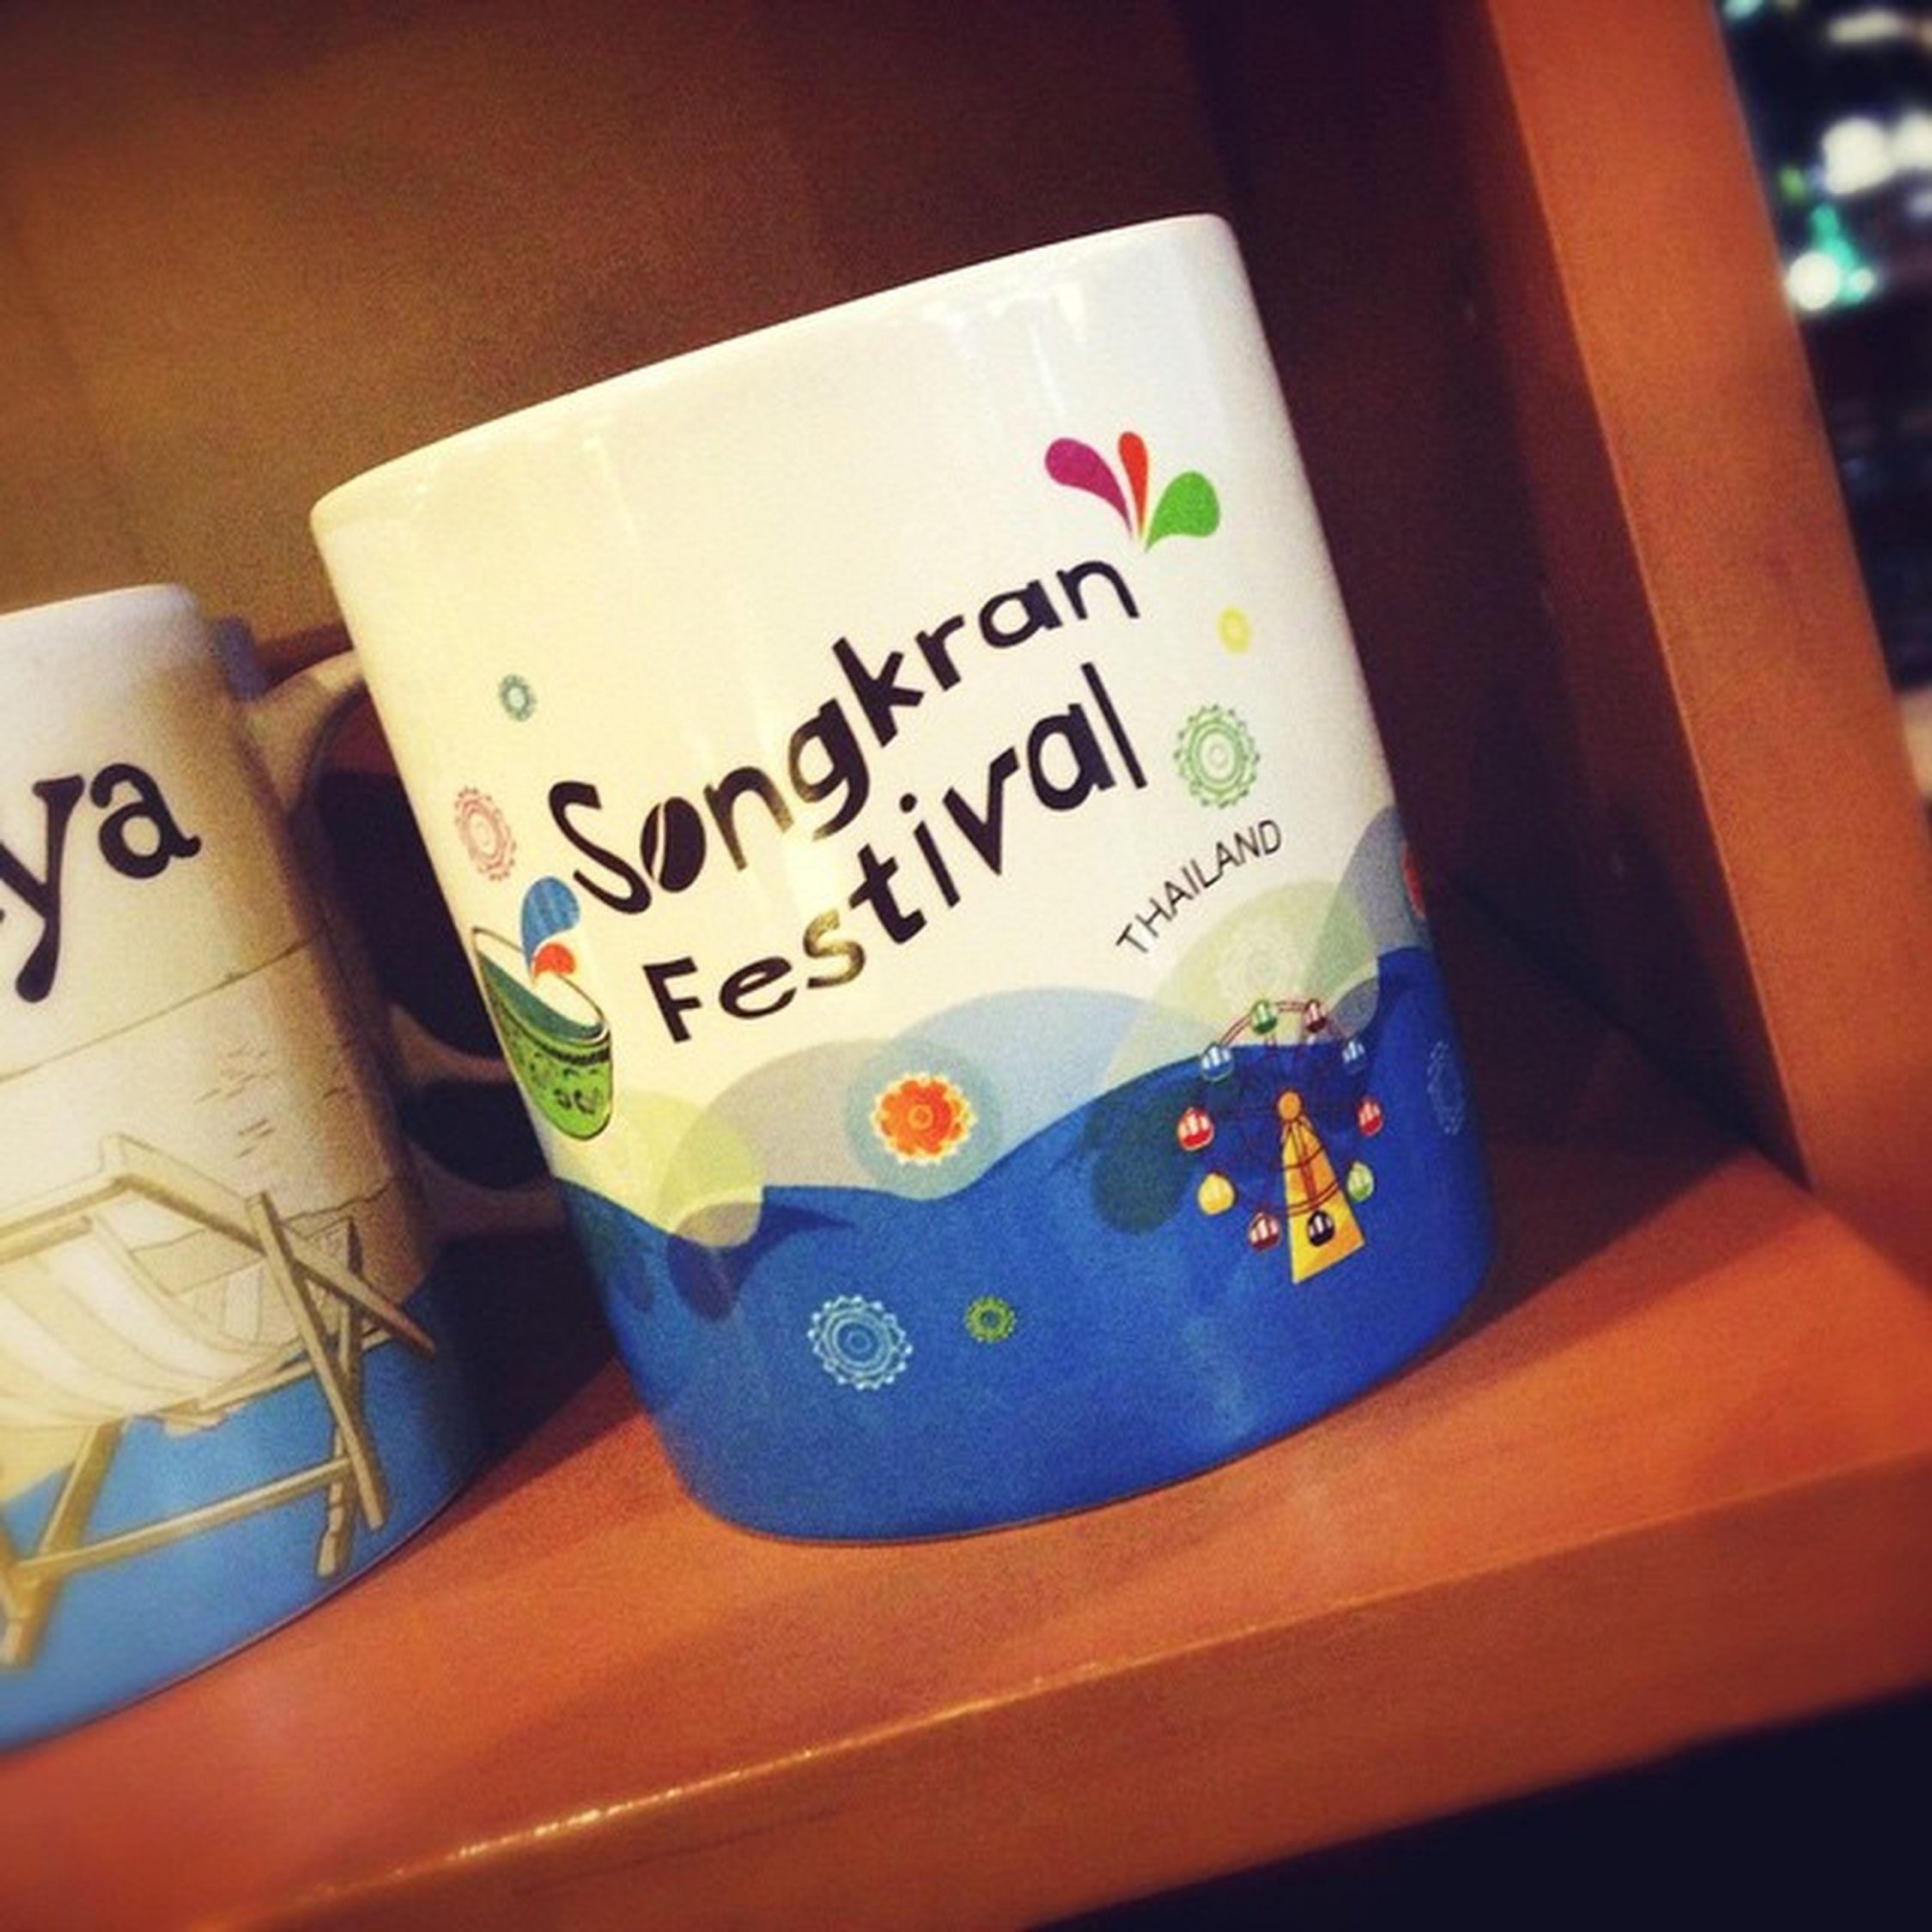 Coffee Starbucks Thailand スターバックス Khonkaen タイ Starbucksmug コンケーン Kosahotel マグ Kosa